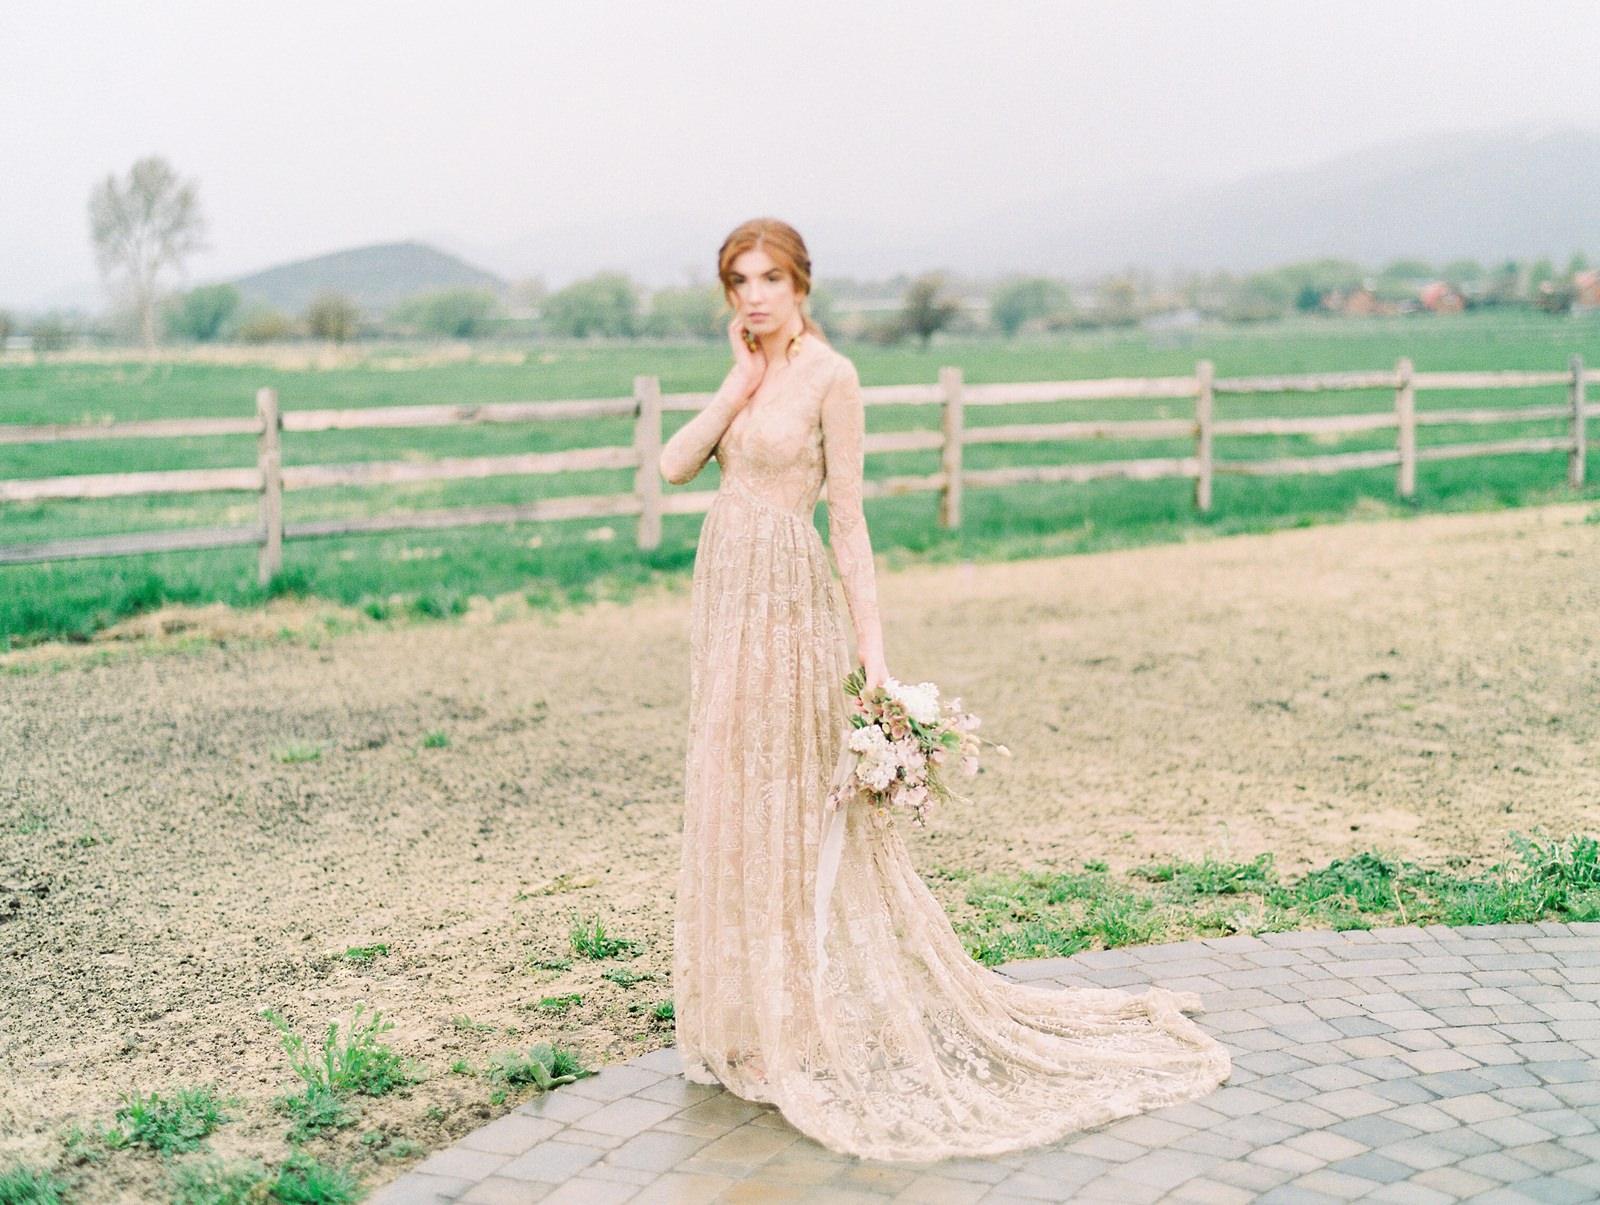 Heber Valley Natural Organic Wedding Inspiration at River Bottoms Ranch, Utah wedding photography, bride with long sleeve sheer lace wedding dress, farm wedding